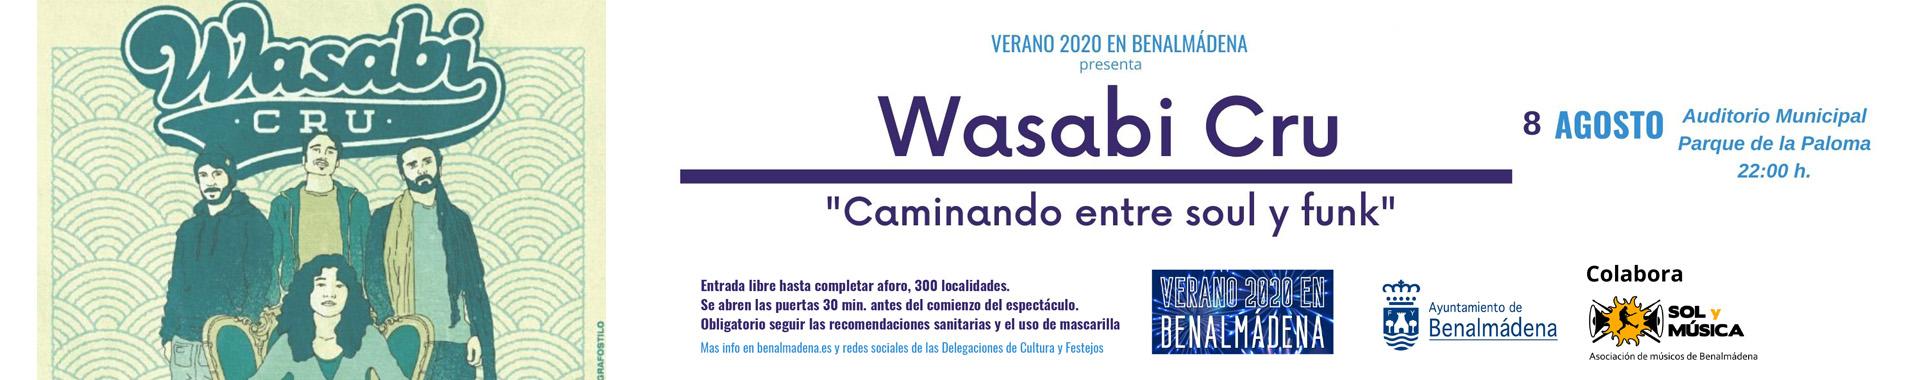 Wasabi Cru